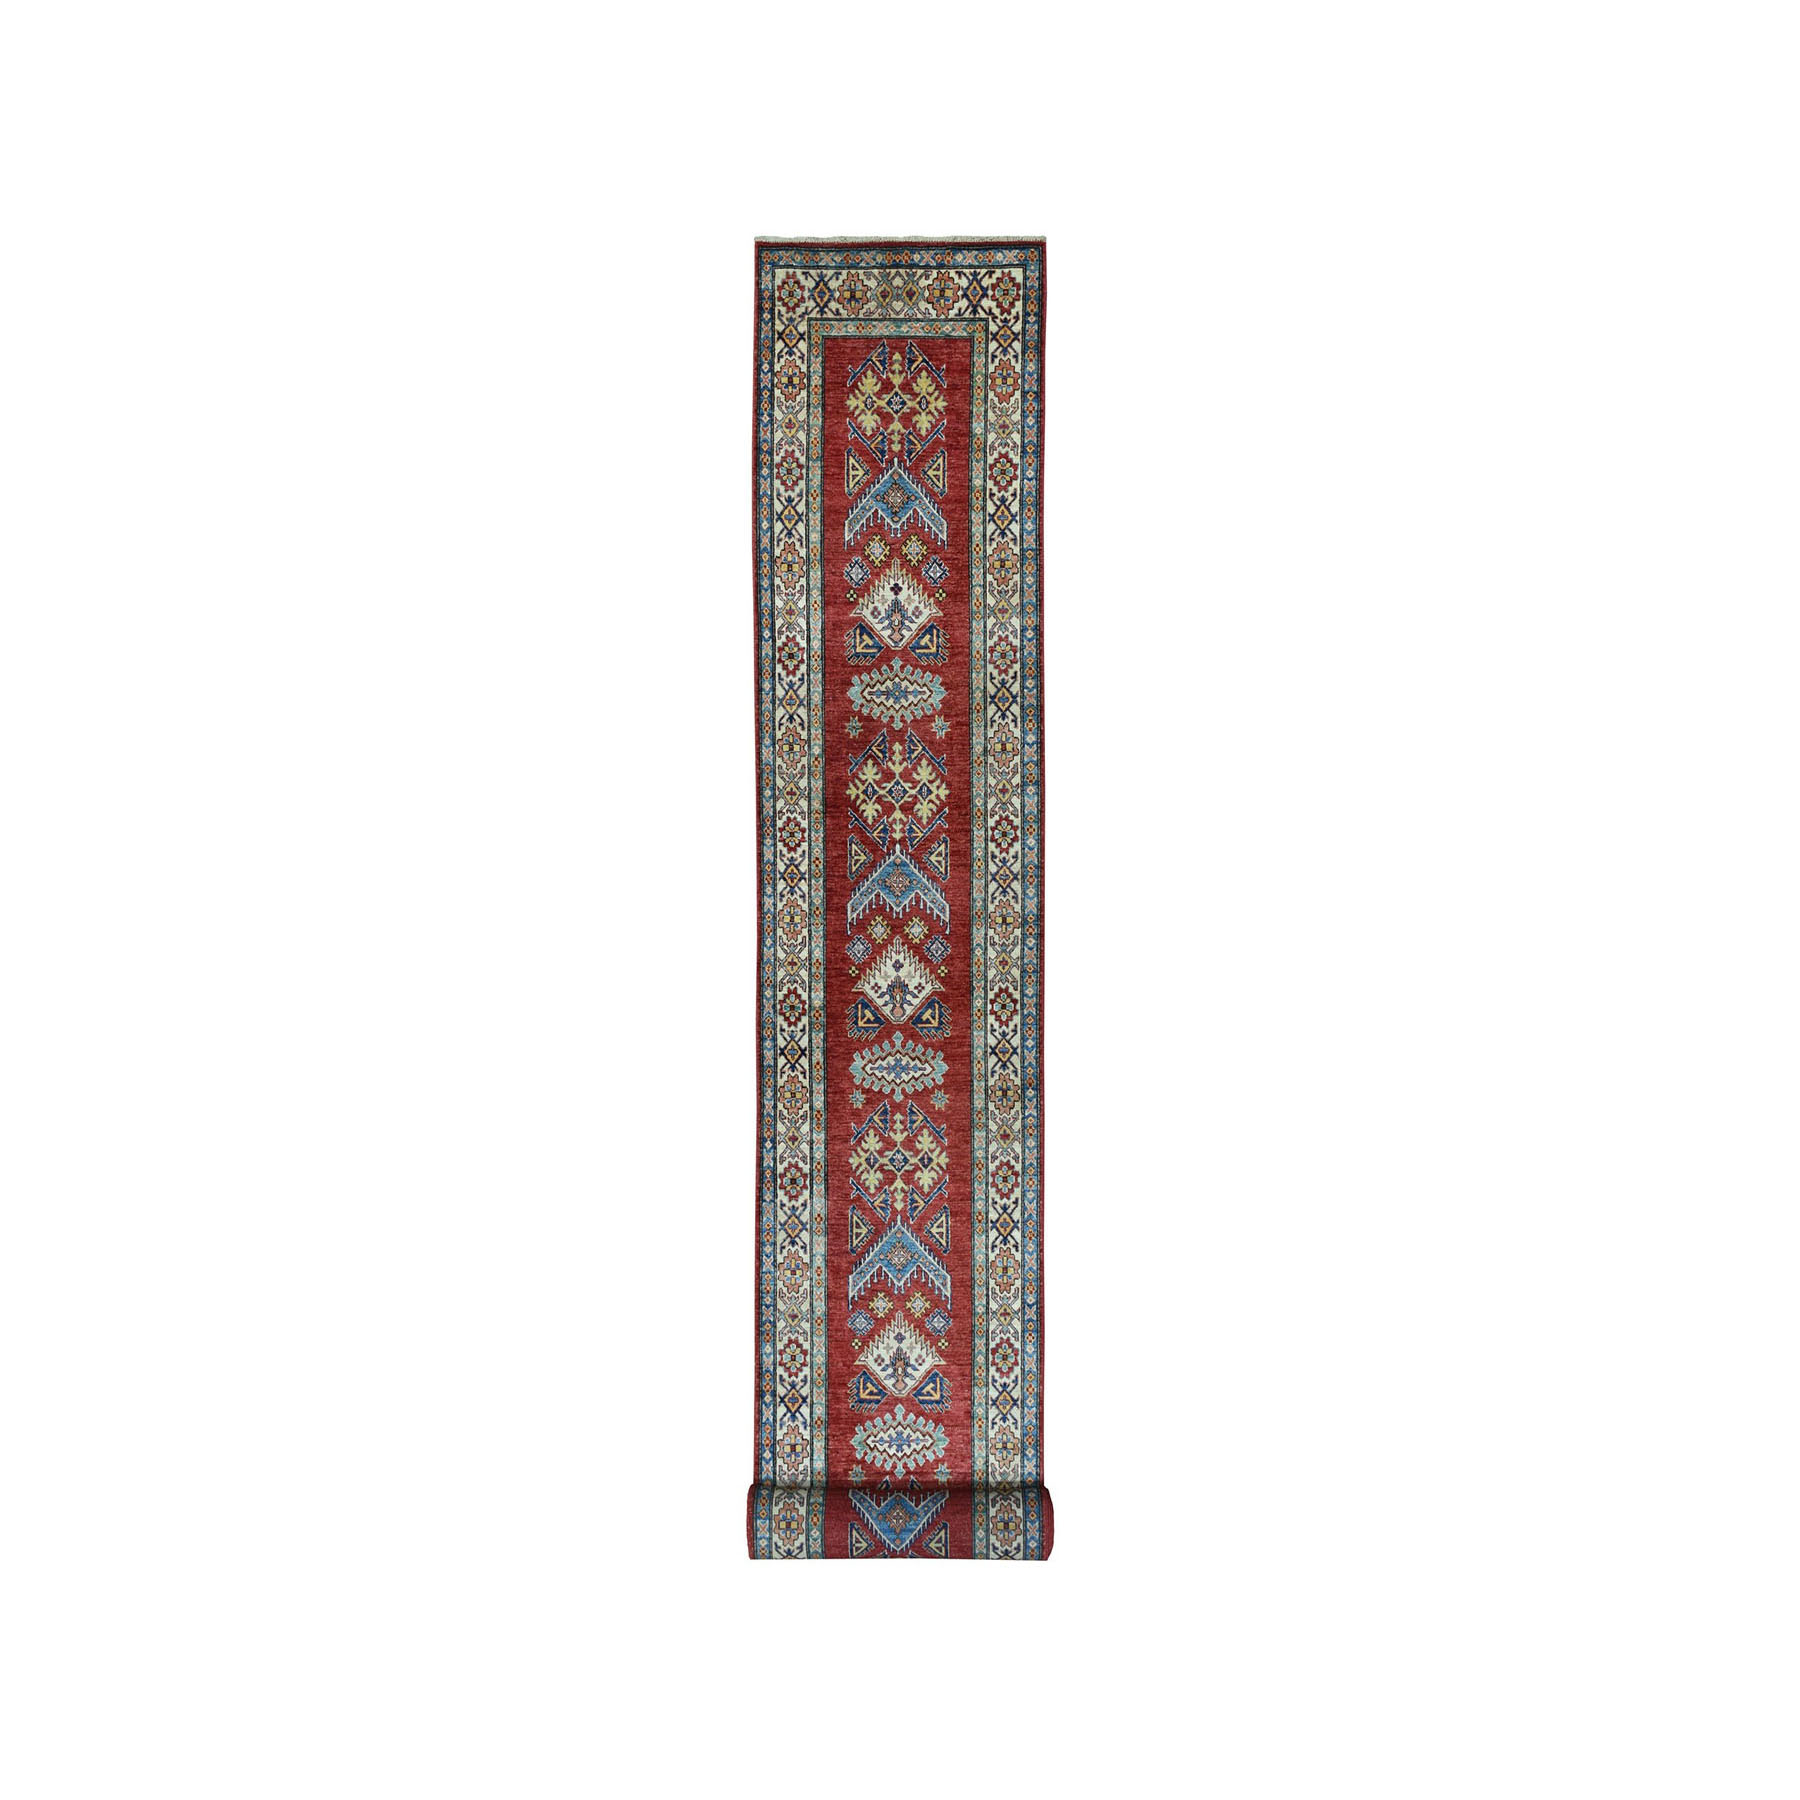 "2'7""X19'9"" Red Super Kazak Geometric Design Xl Runner Pure Wool Hand-Knotted Oriental Rug moae060e"